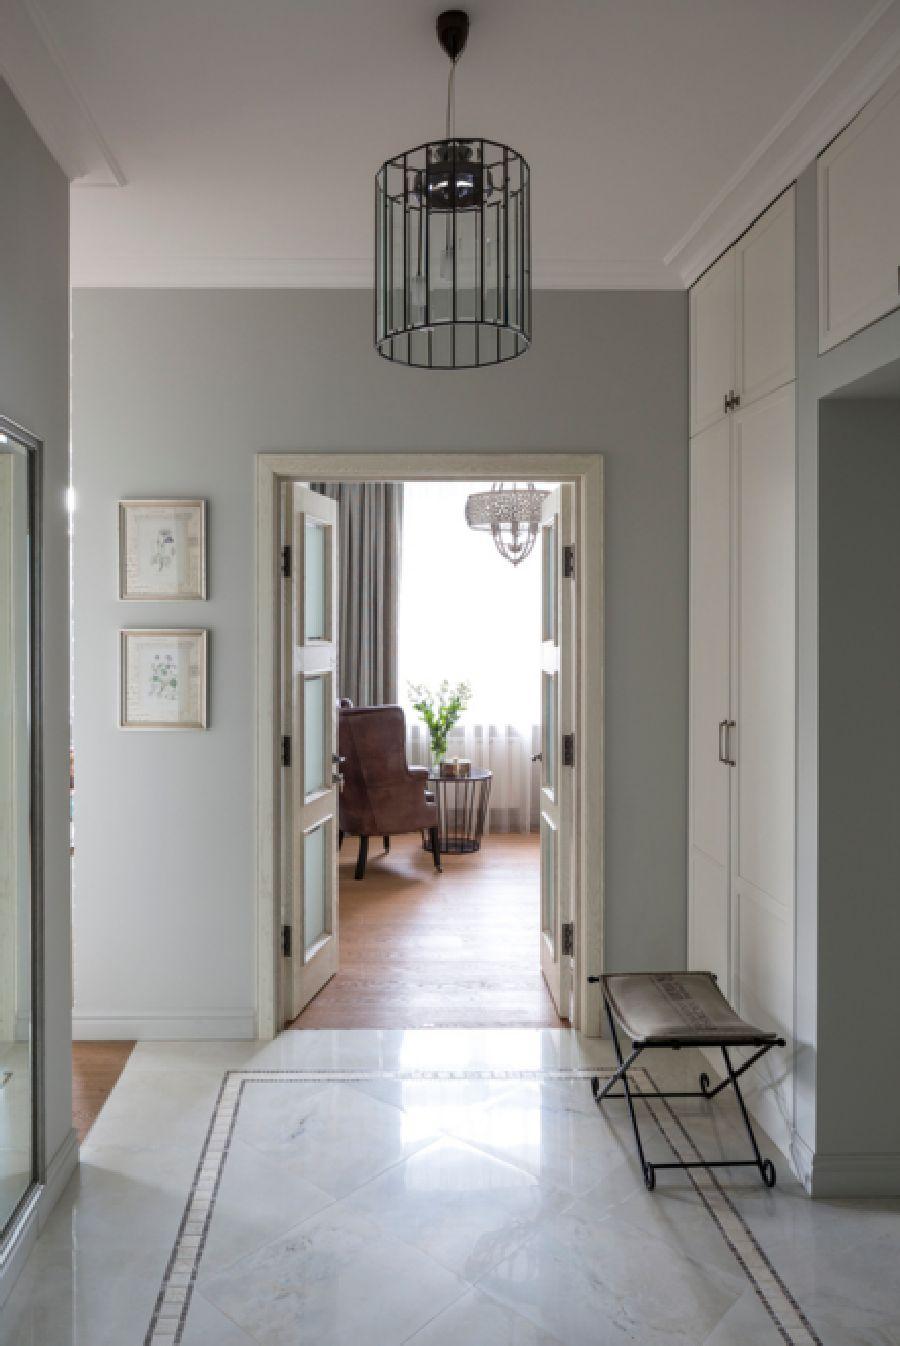 adelaparvu.com despre apartament de 80 mp patrati cu aer rustic elegant, locuinta Rusia, designer Zhenya Zhdanova (14)